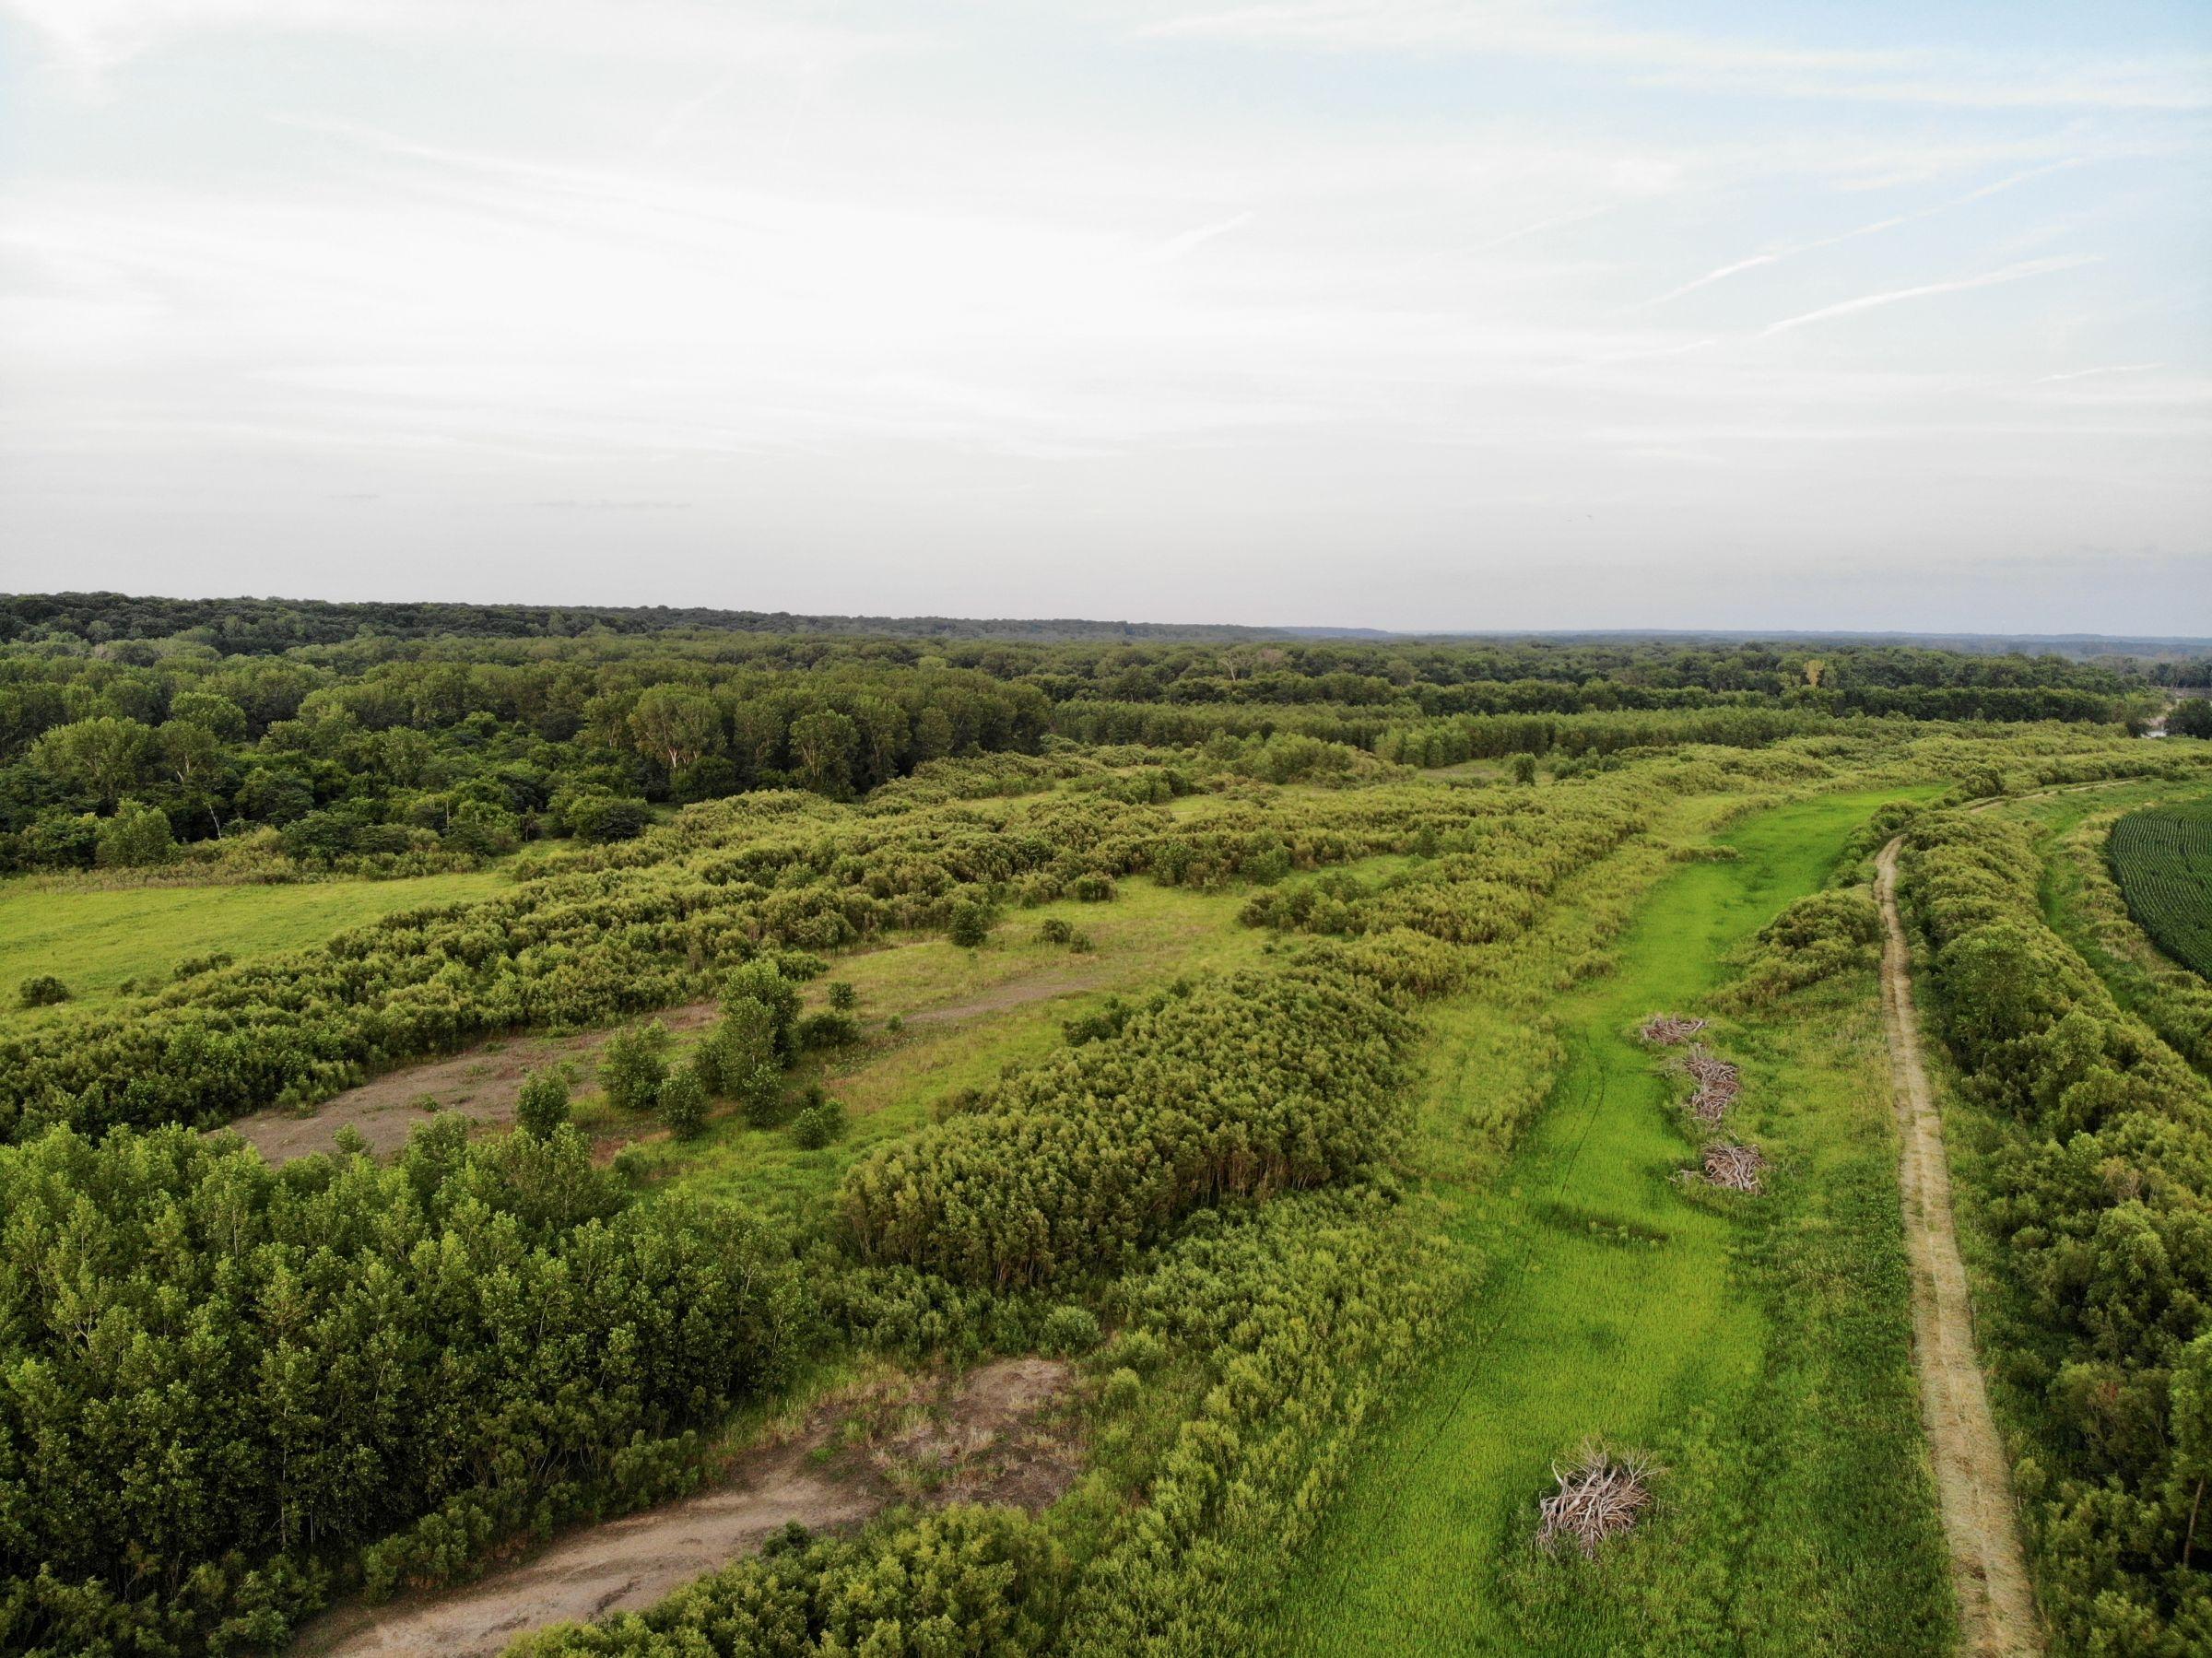 land-warren-county-iowa-158-acres-listing-number-15623-5-2021-07-07-211322.jpg